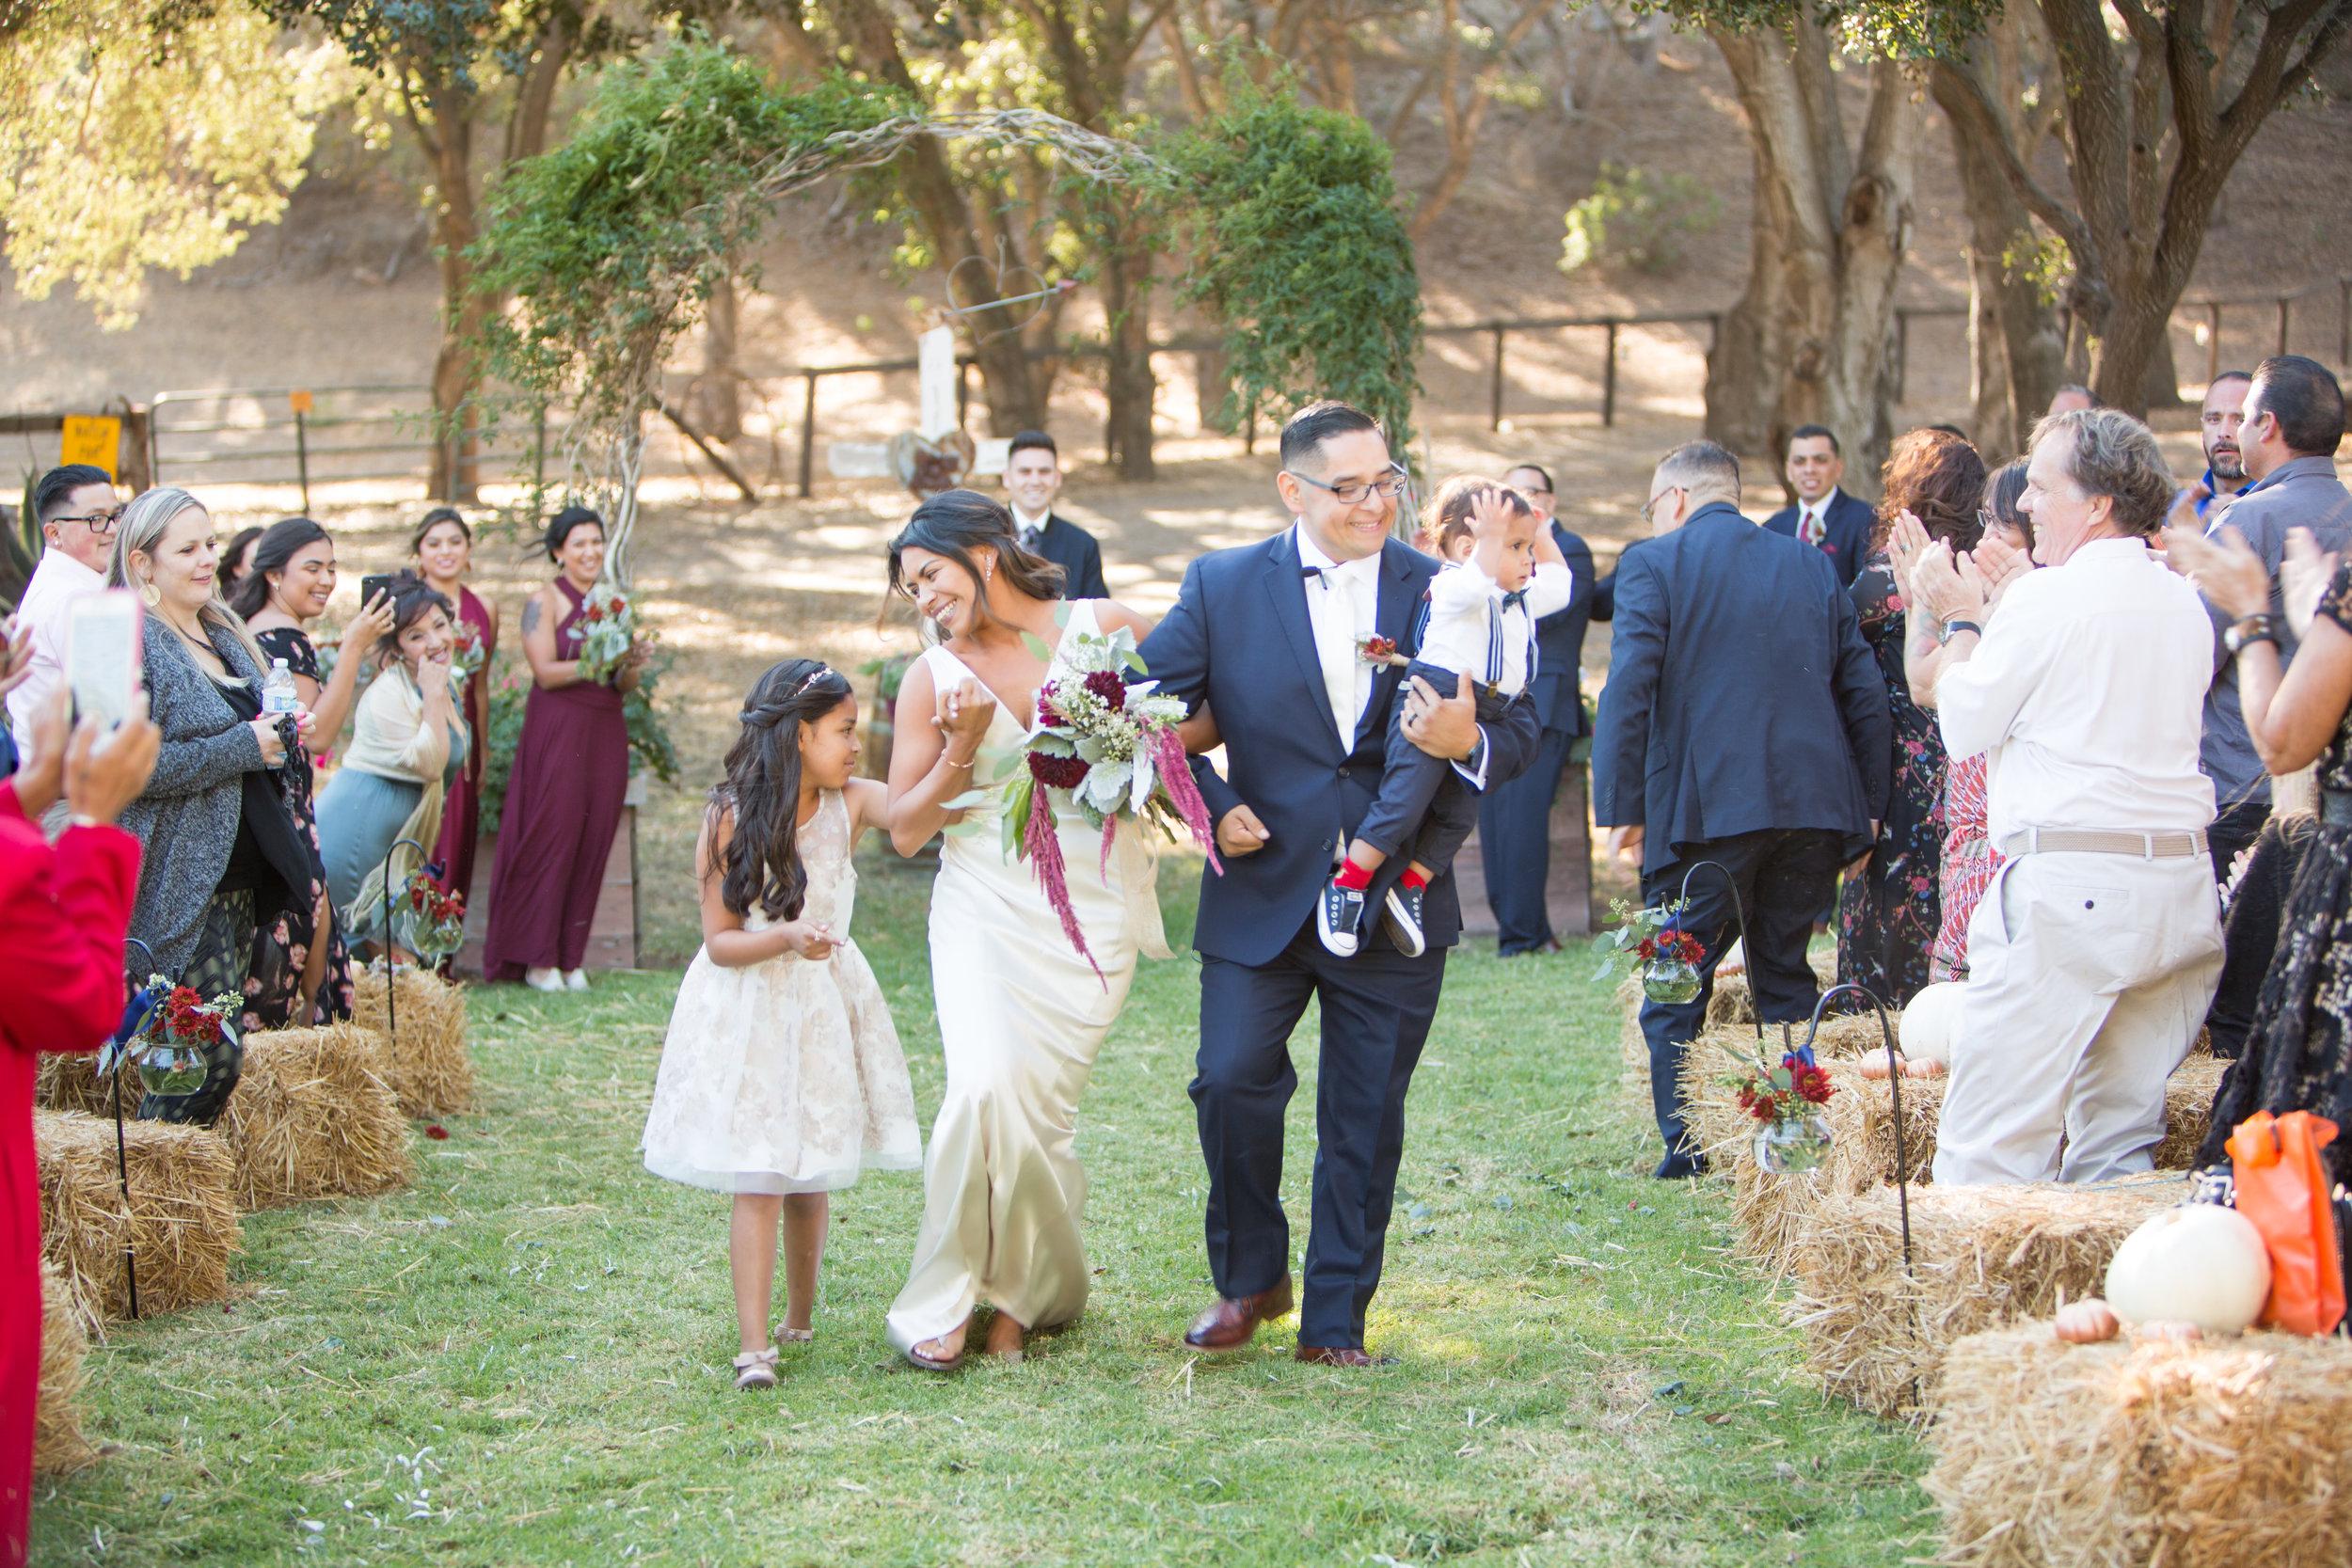 Danny & Vanessa's Wedding - Arroyo Grande CA,October 21st, 2017